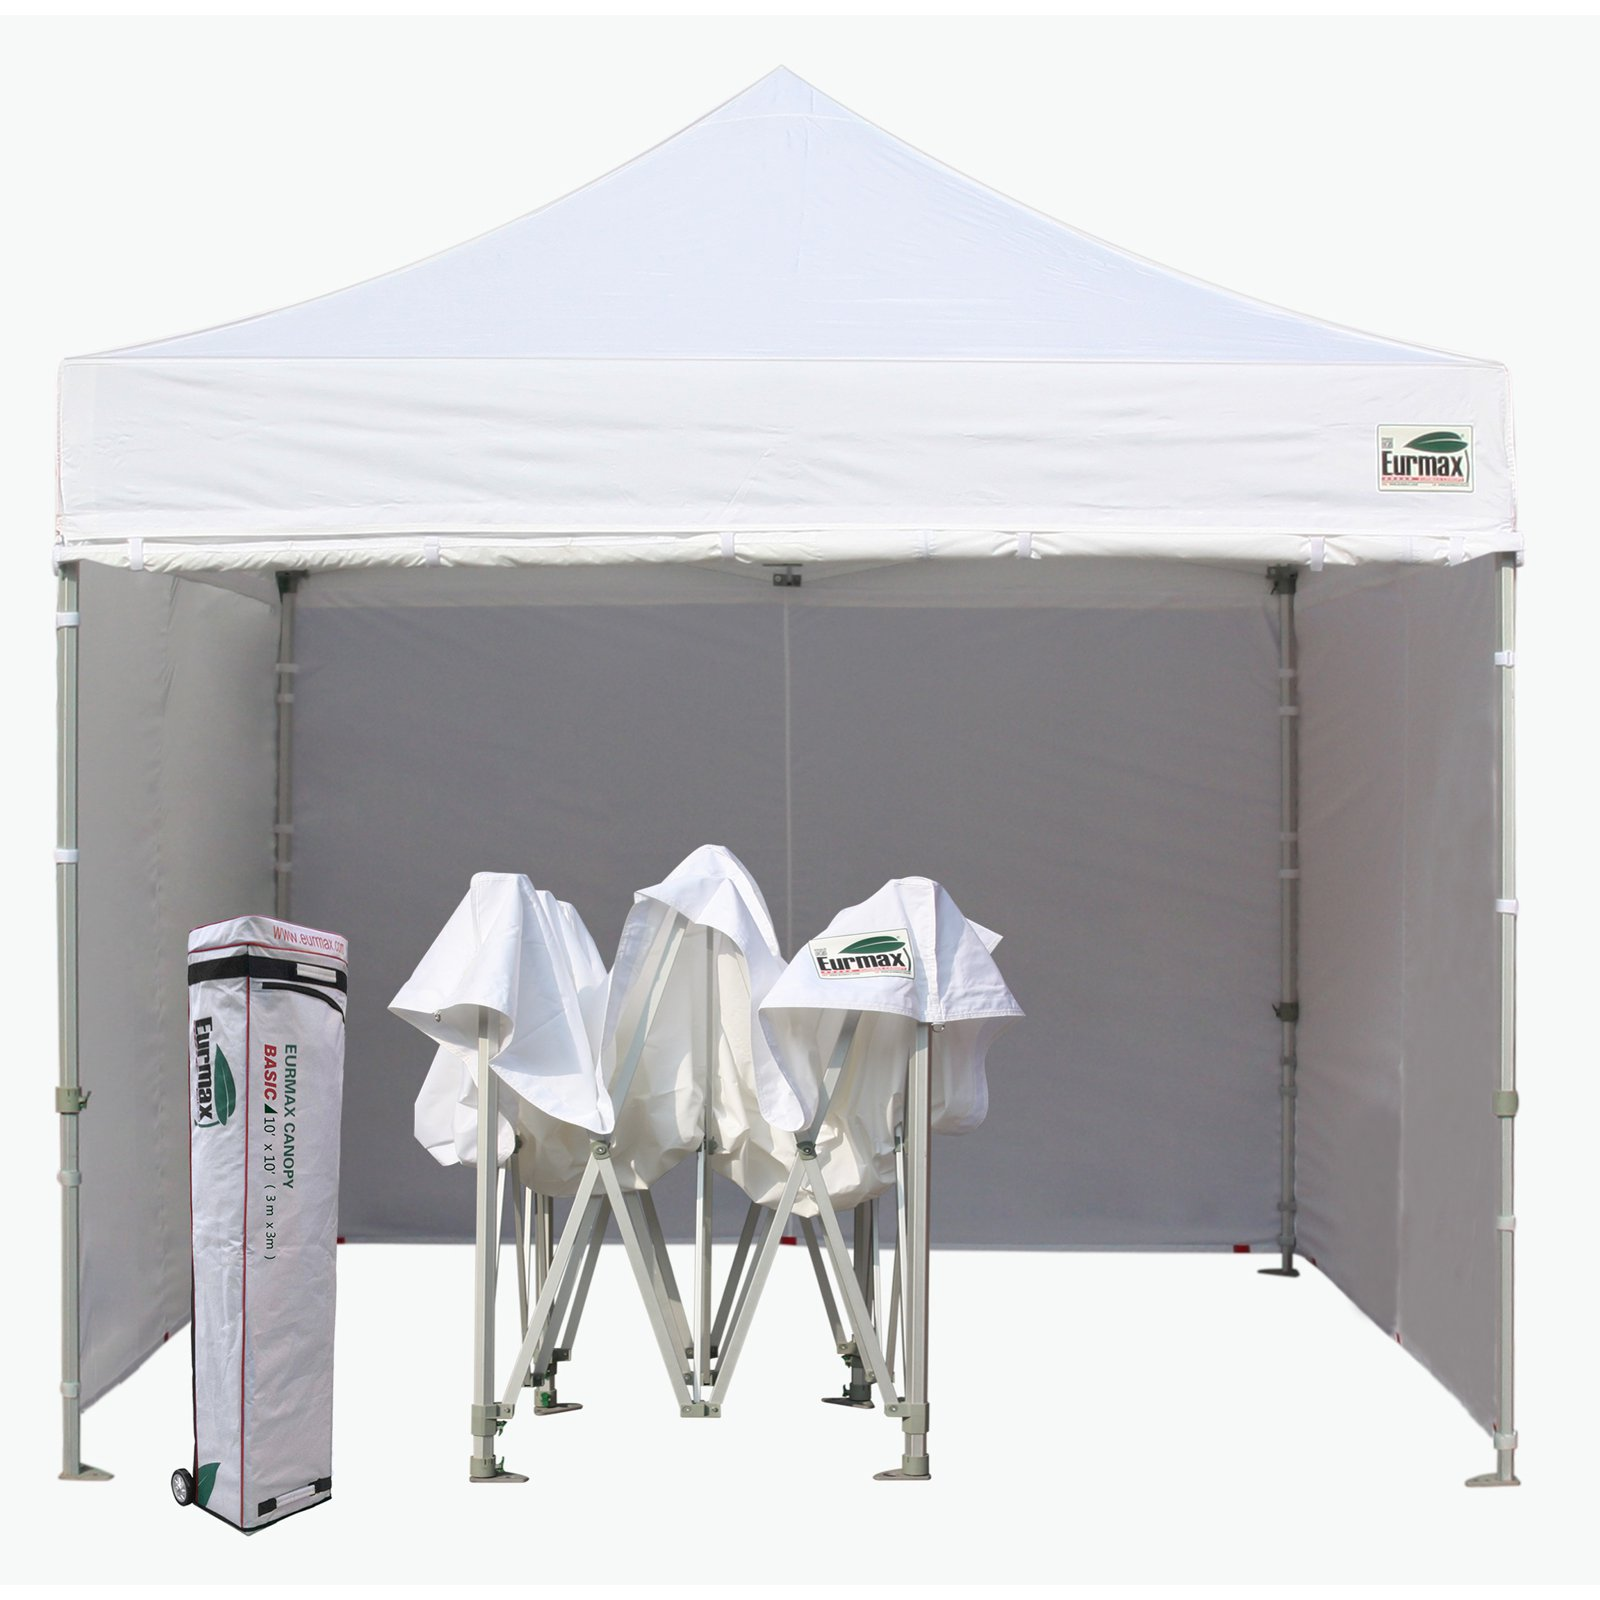 Eurmax Canopy Inc Commercial 10 x 10 ft. Zipper Wall Canopy Tent